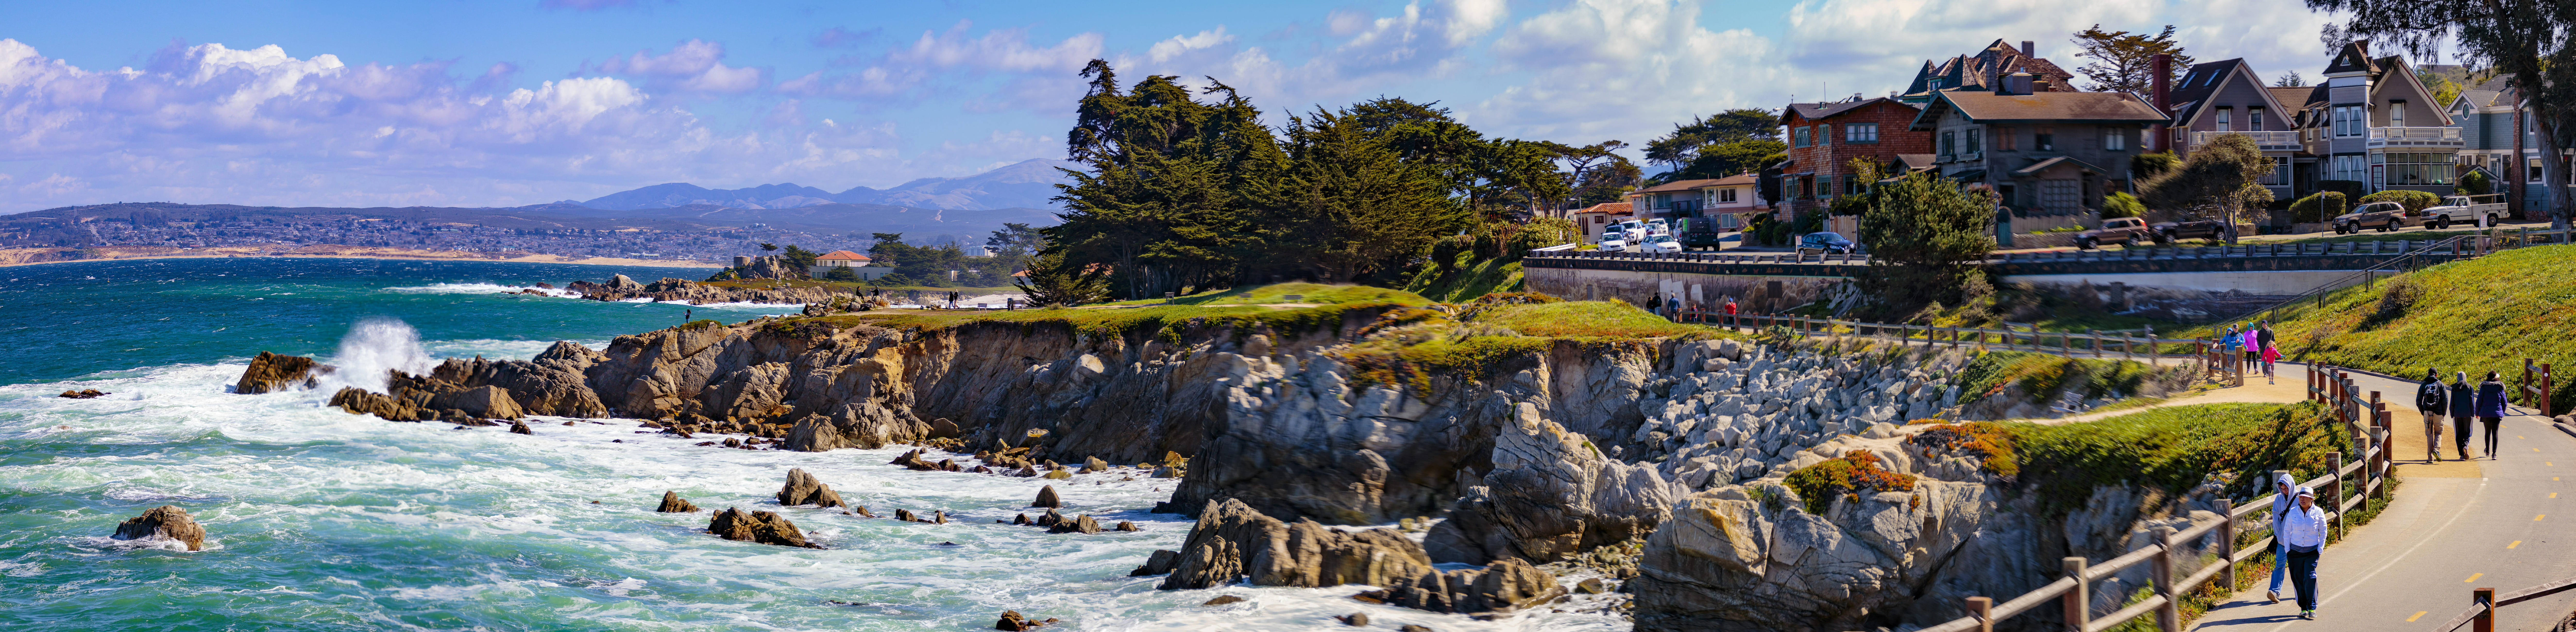 Permits Carmel by the Sea